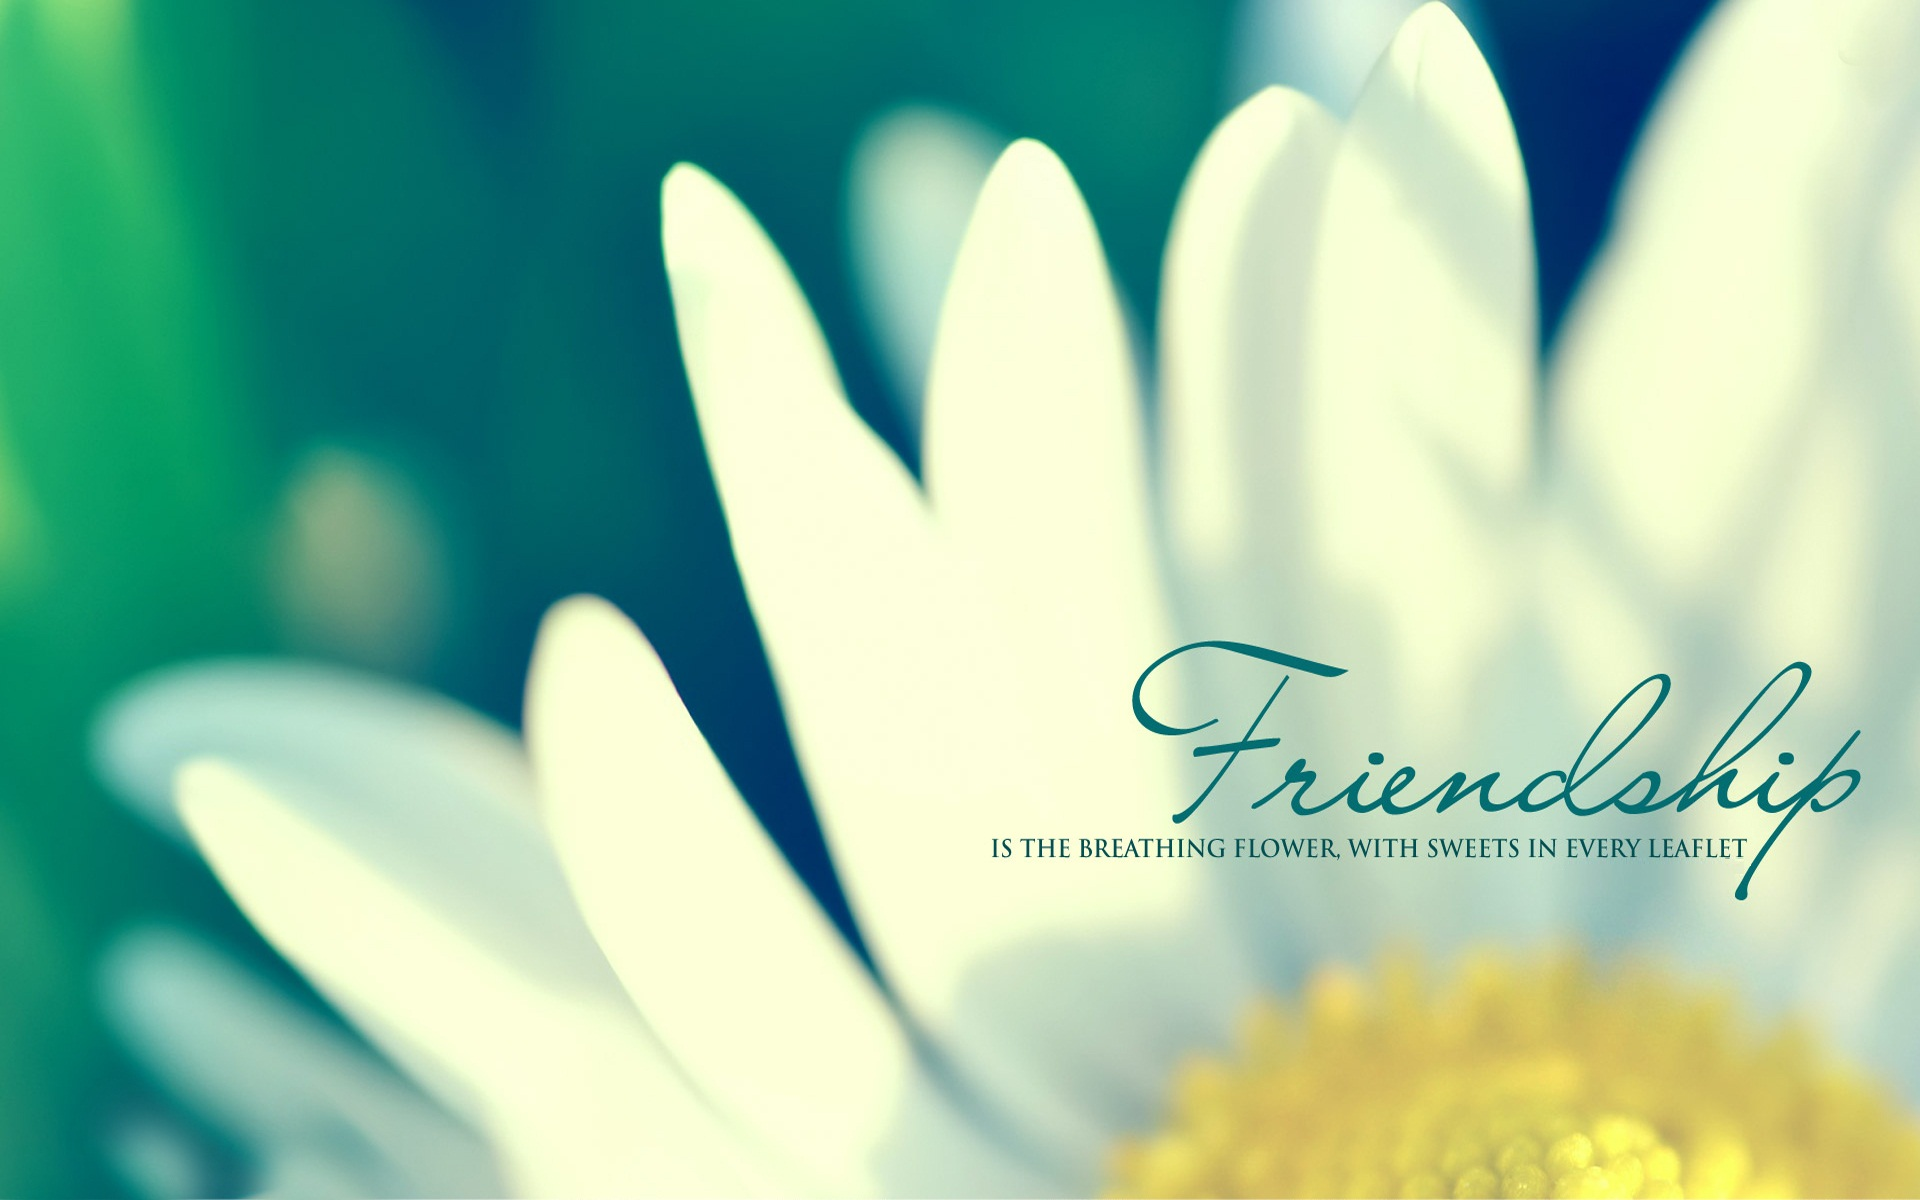 Friendship Quotes Desktop Backgrounds   Wallpaper High Definition 1920x1200